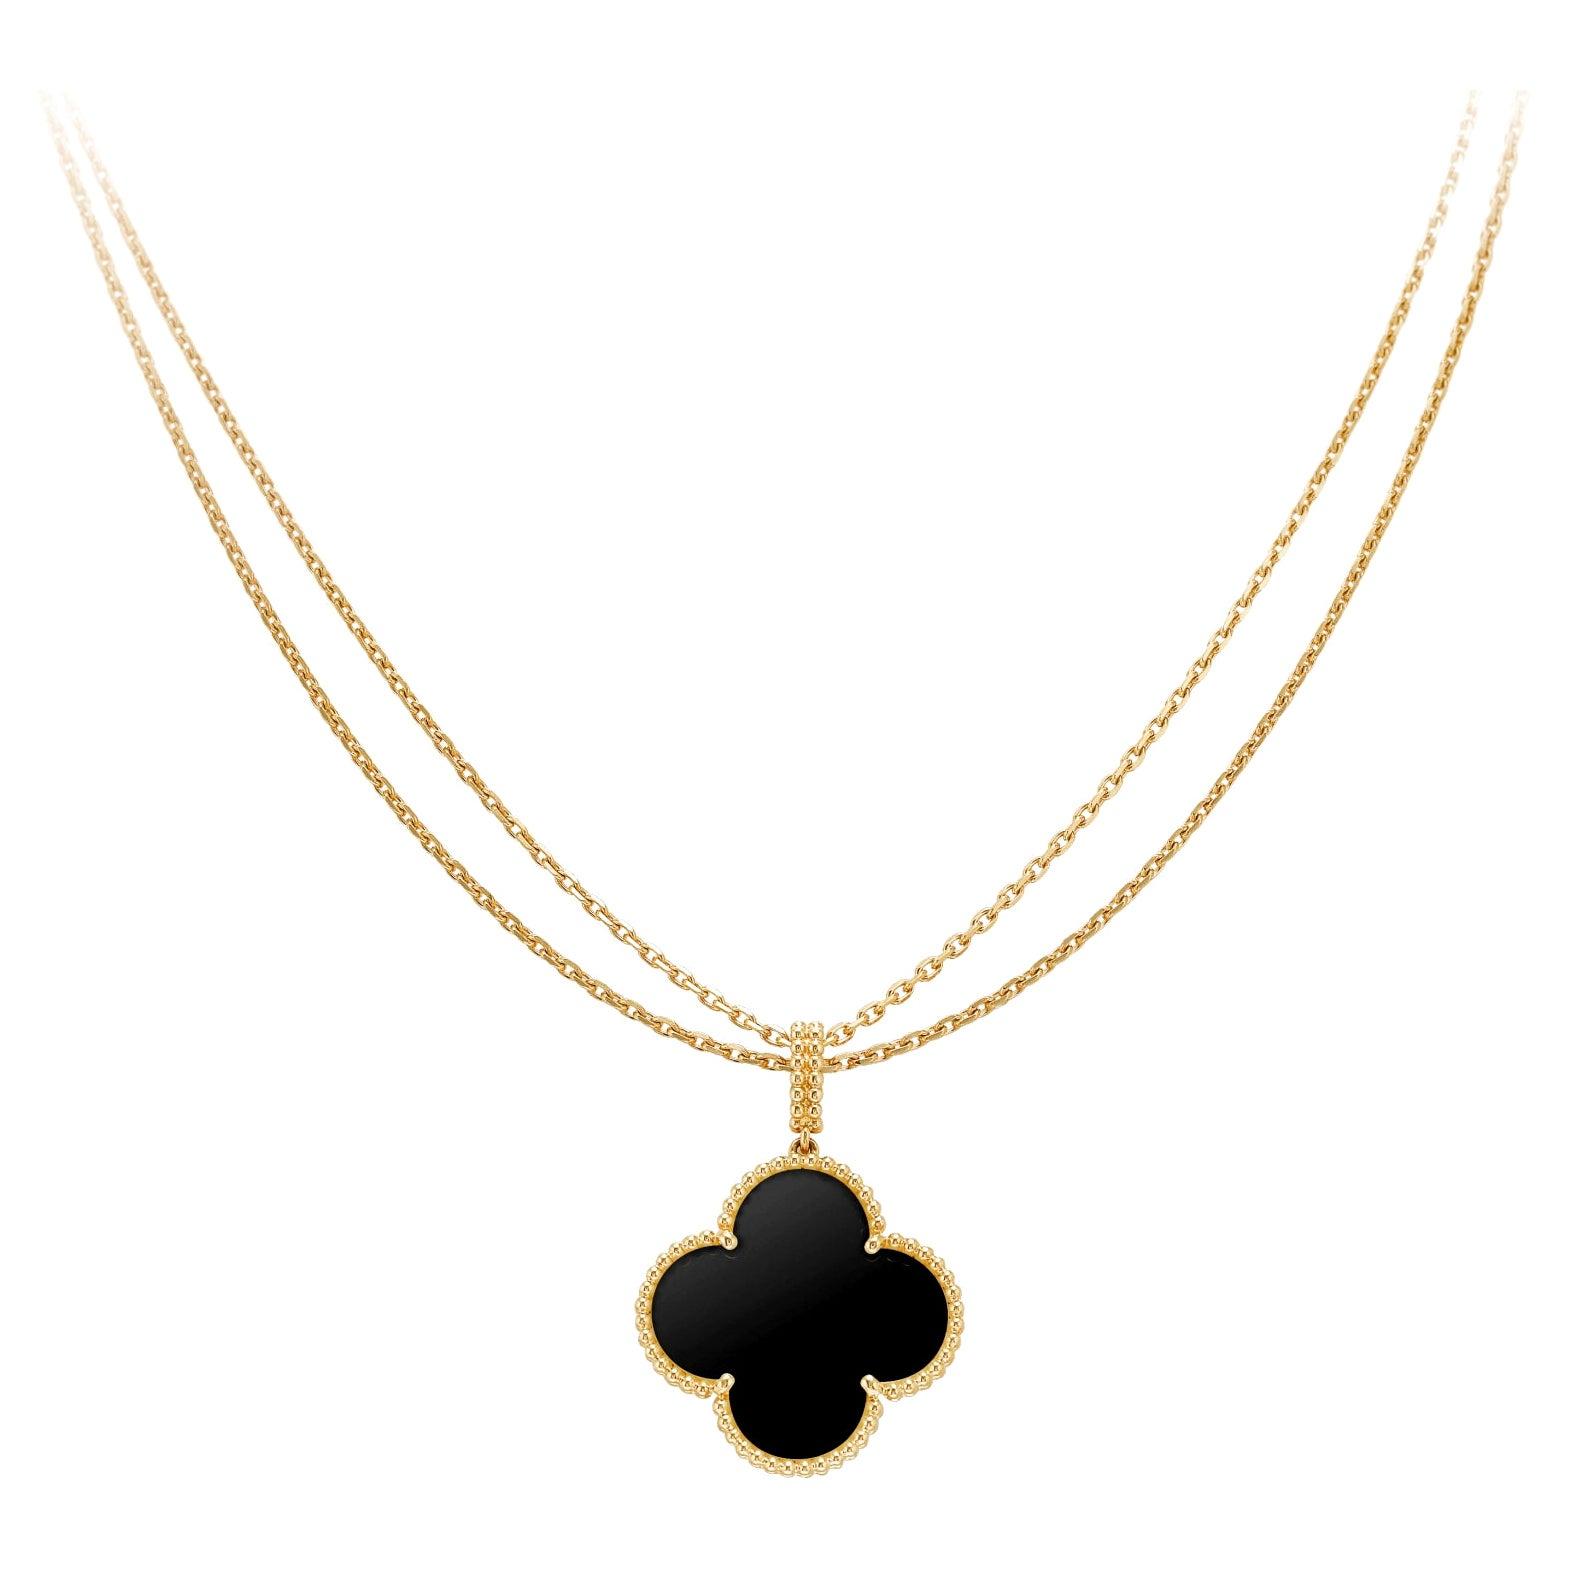 "Van Cleef & Arpels ""Magic Alhambra"" Long Necklace One Motif Onyx Pendant"